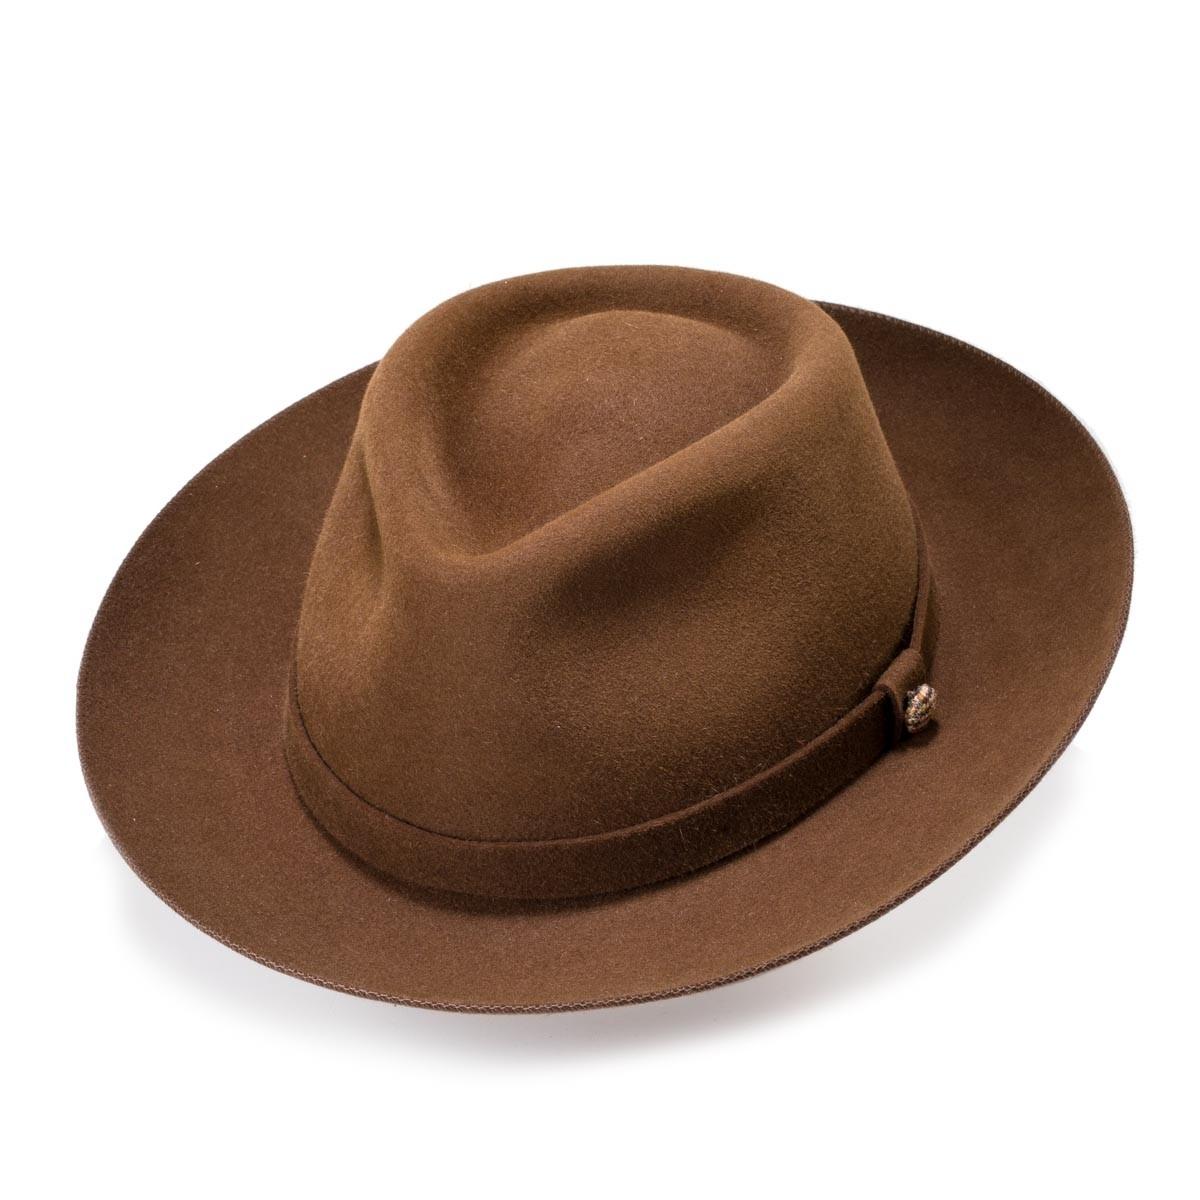 Euston Maltese Brown Fedora Fedora Hat. Handmade Fernandez y Roche